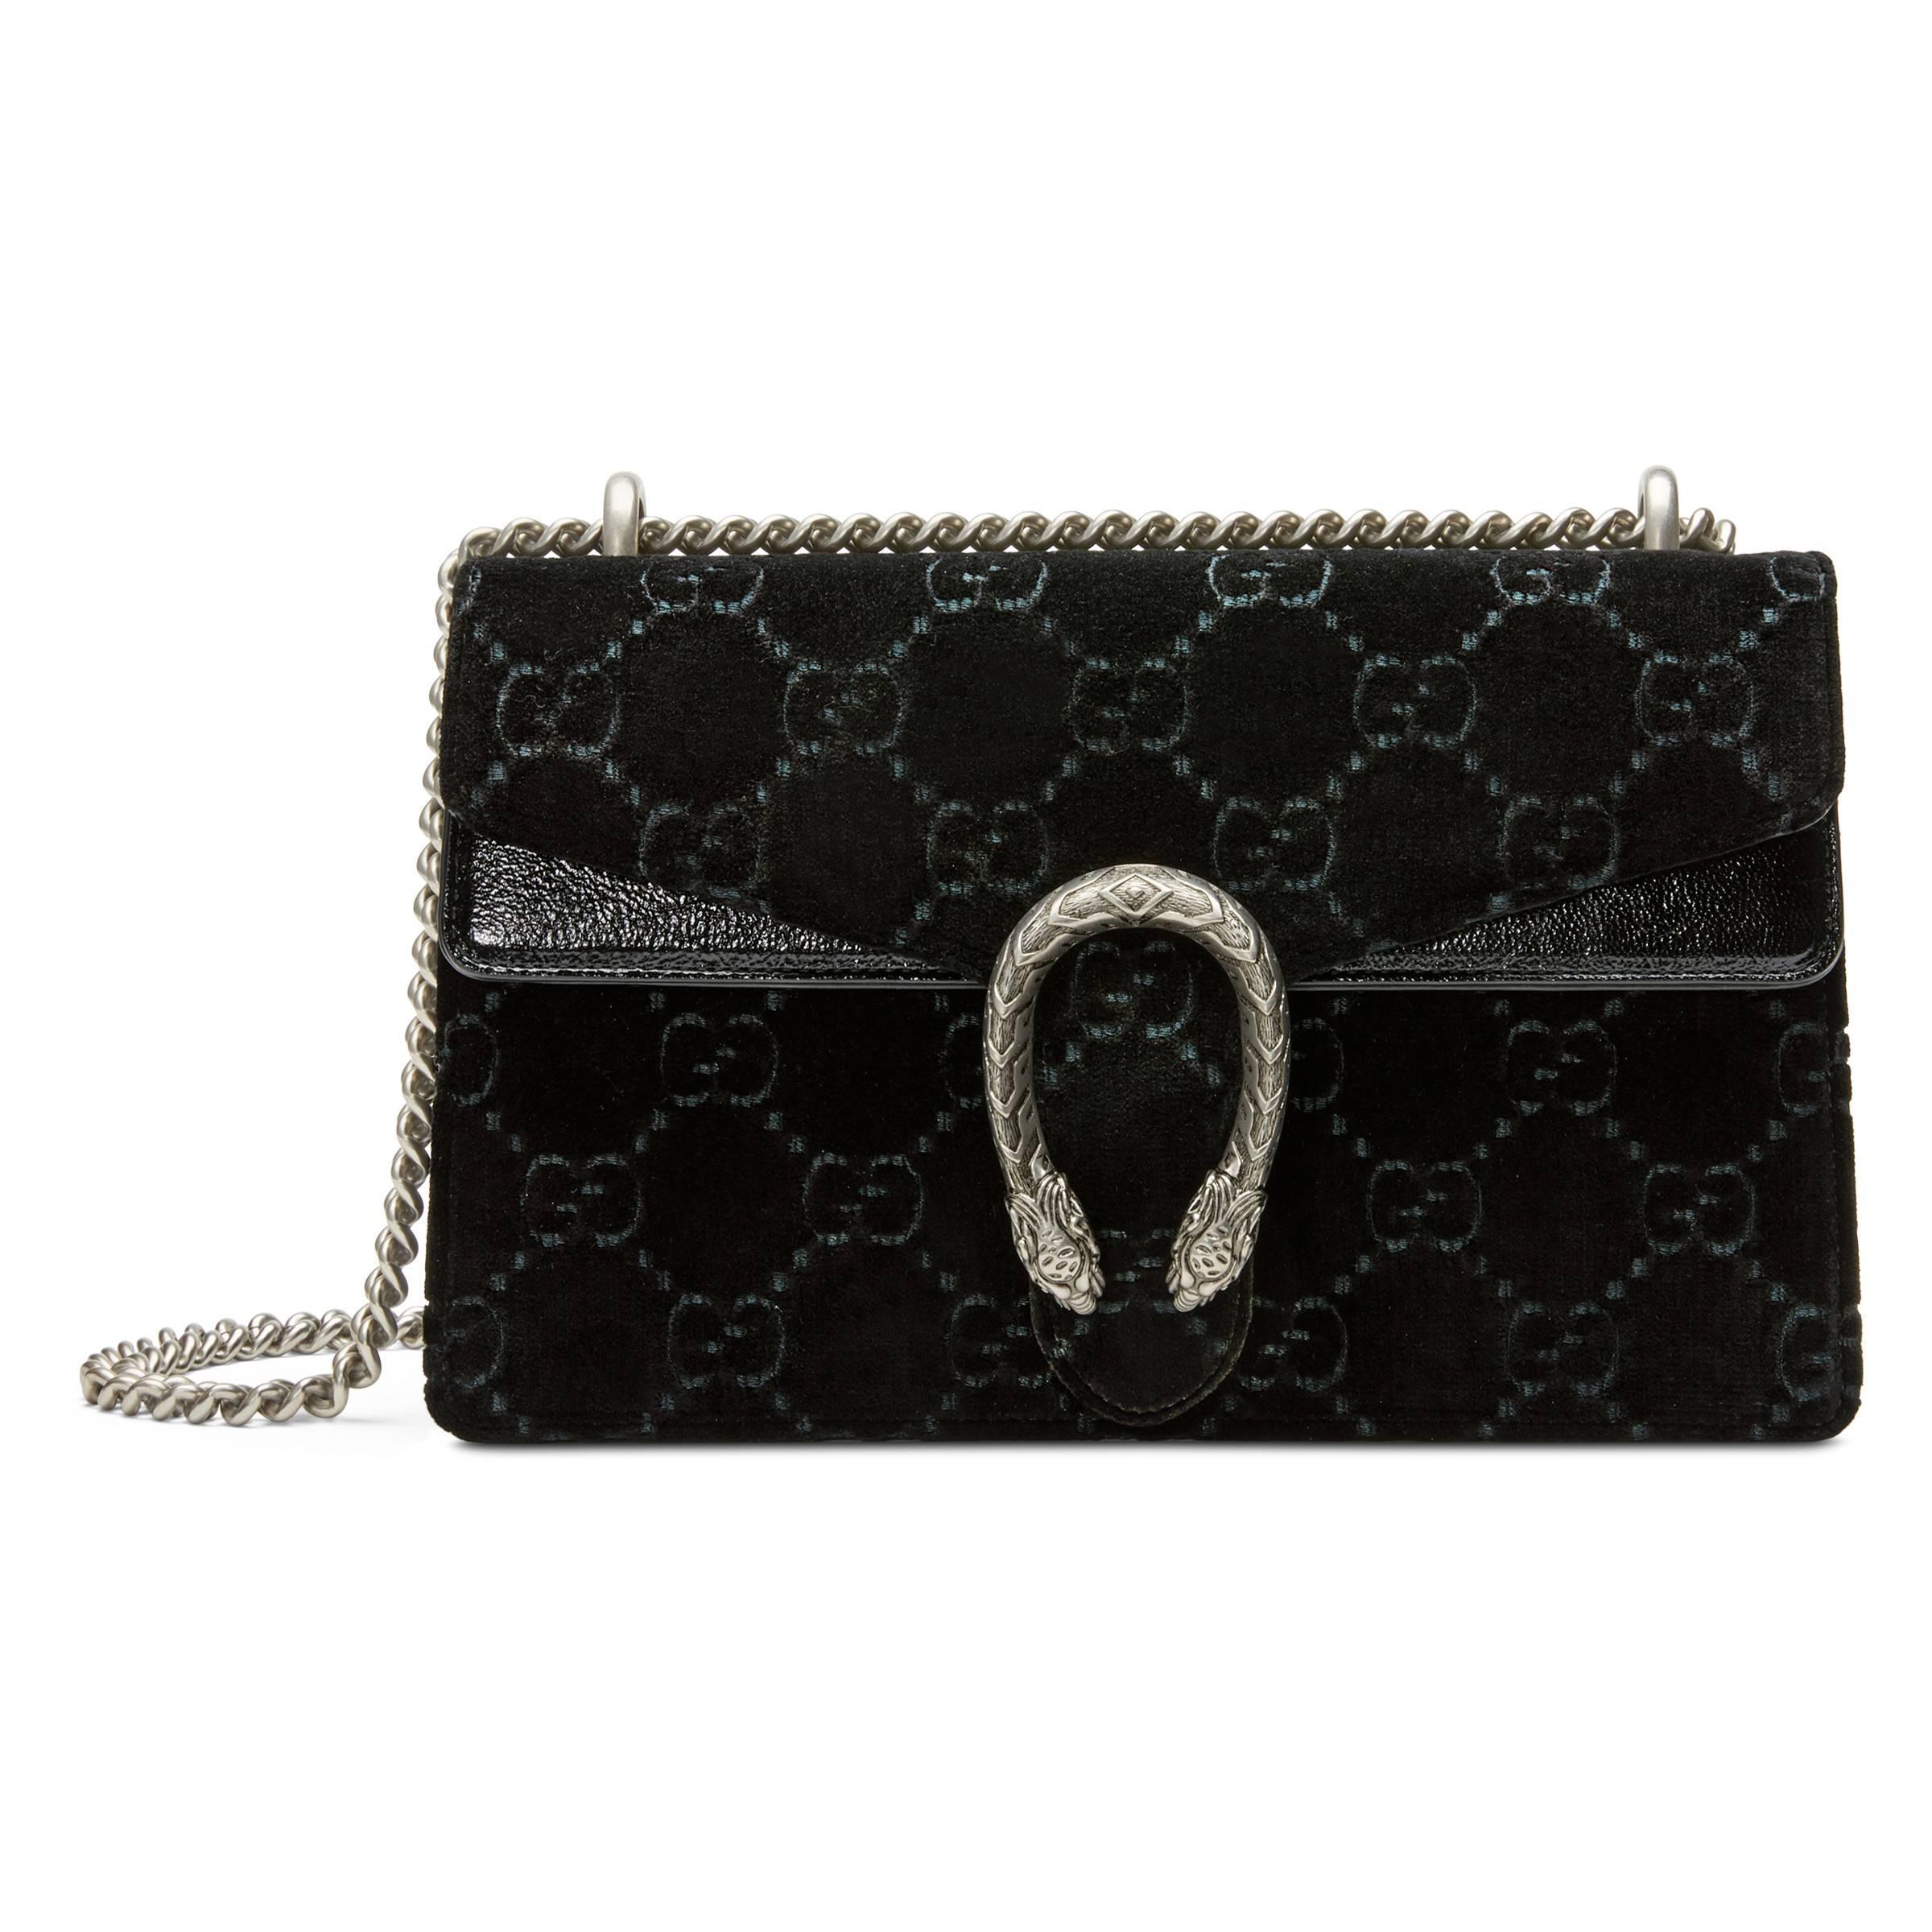 df8e1b45b59c Gucci - Black Dionysus GG Velvet Small Shoulder Bag - Lyst. View fullscreen